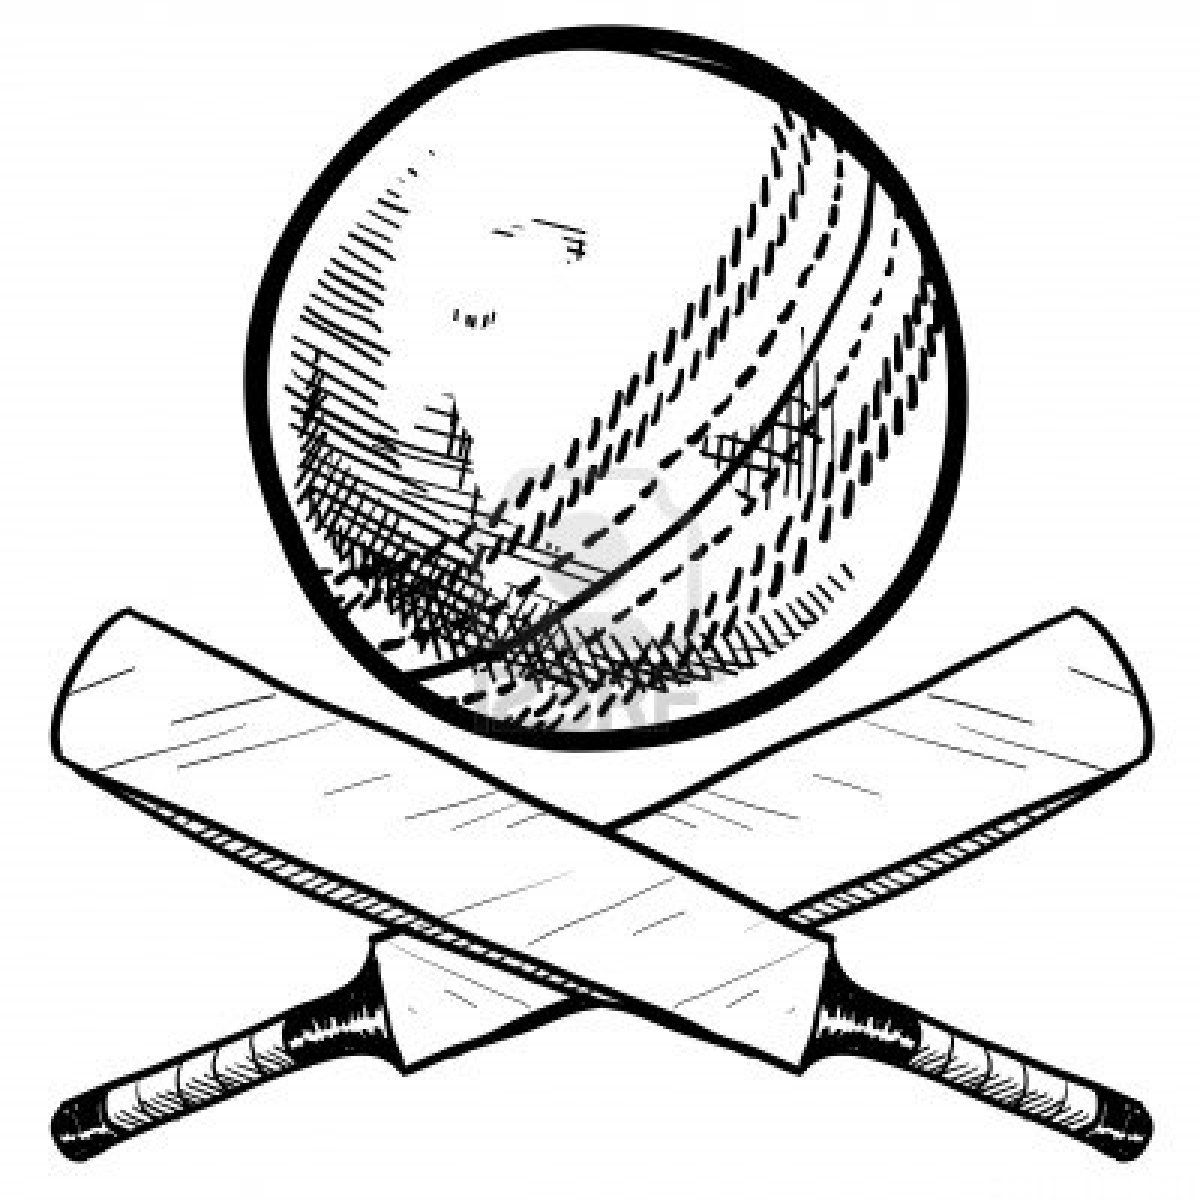 1200x1200 stock vector drawings cricket sport, cricket bat, sports drawings